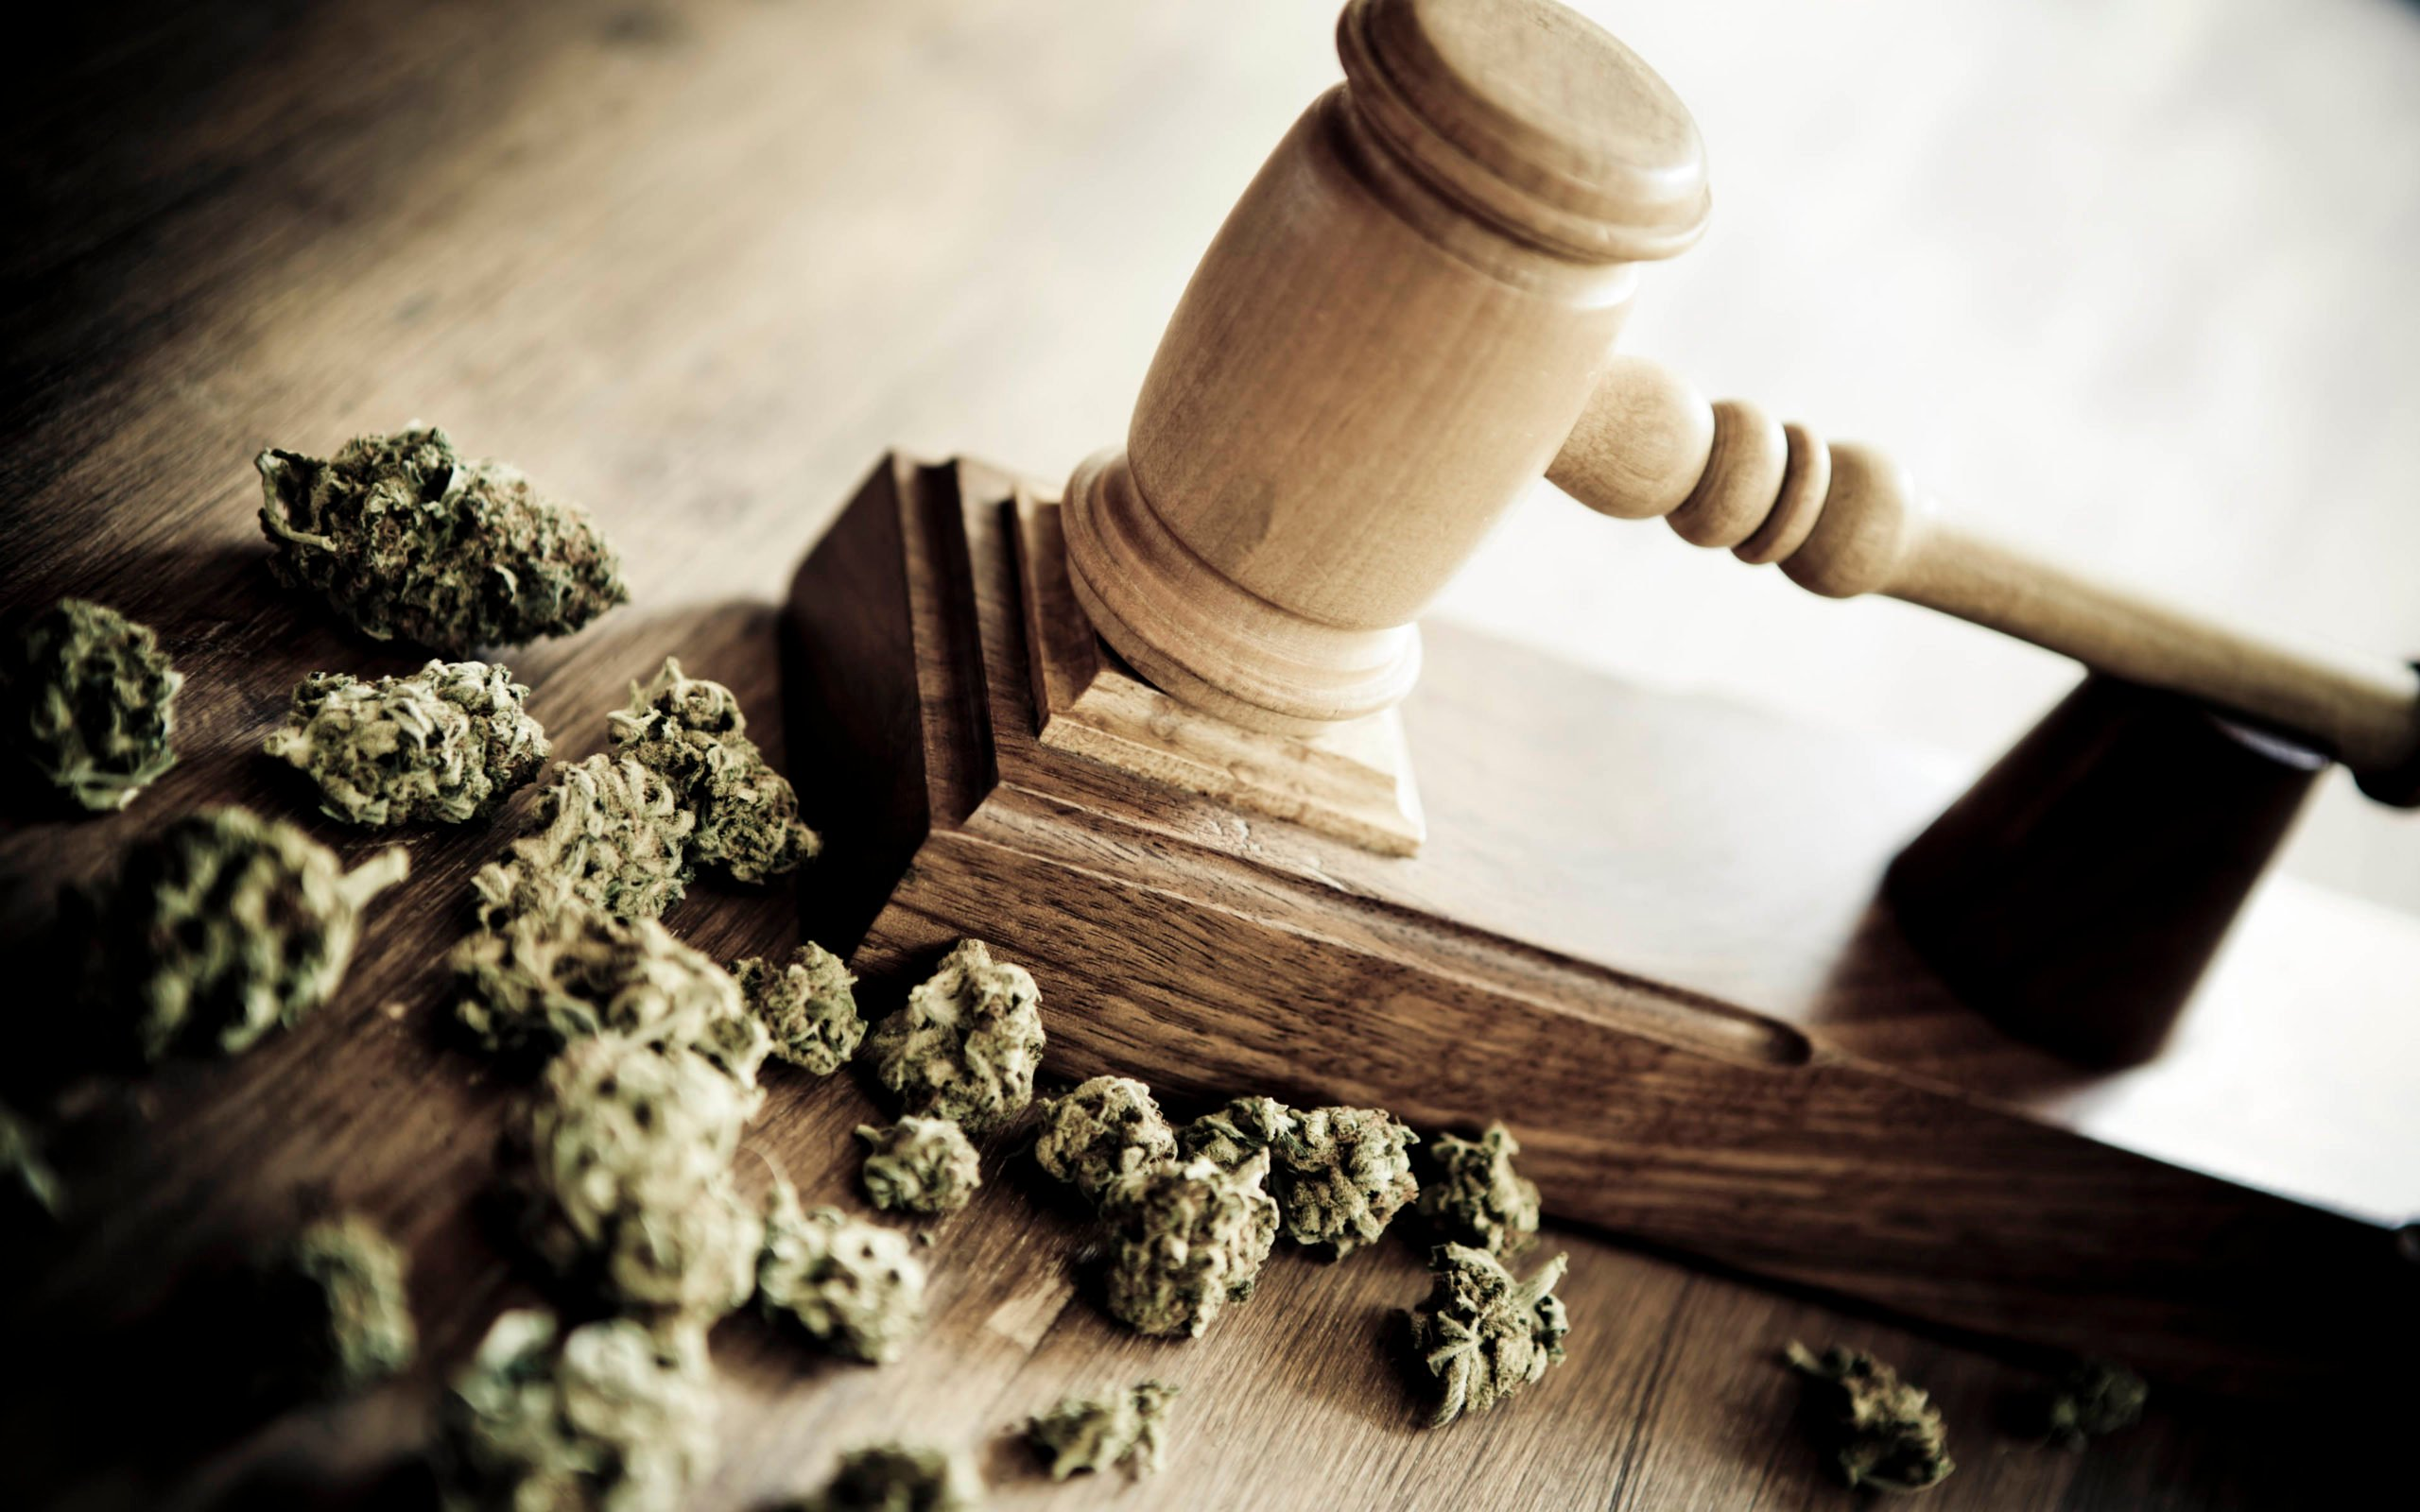 Marijuana and criminallity